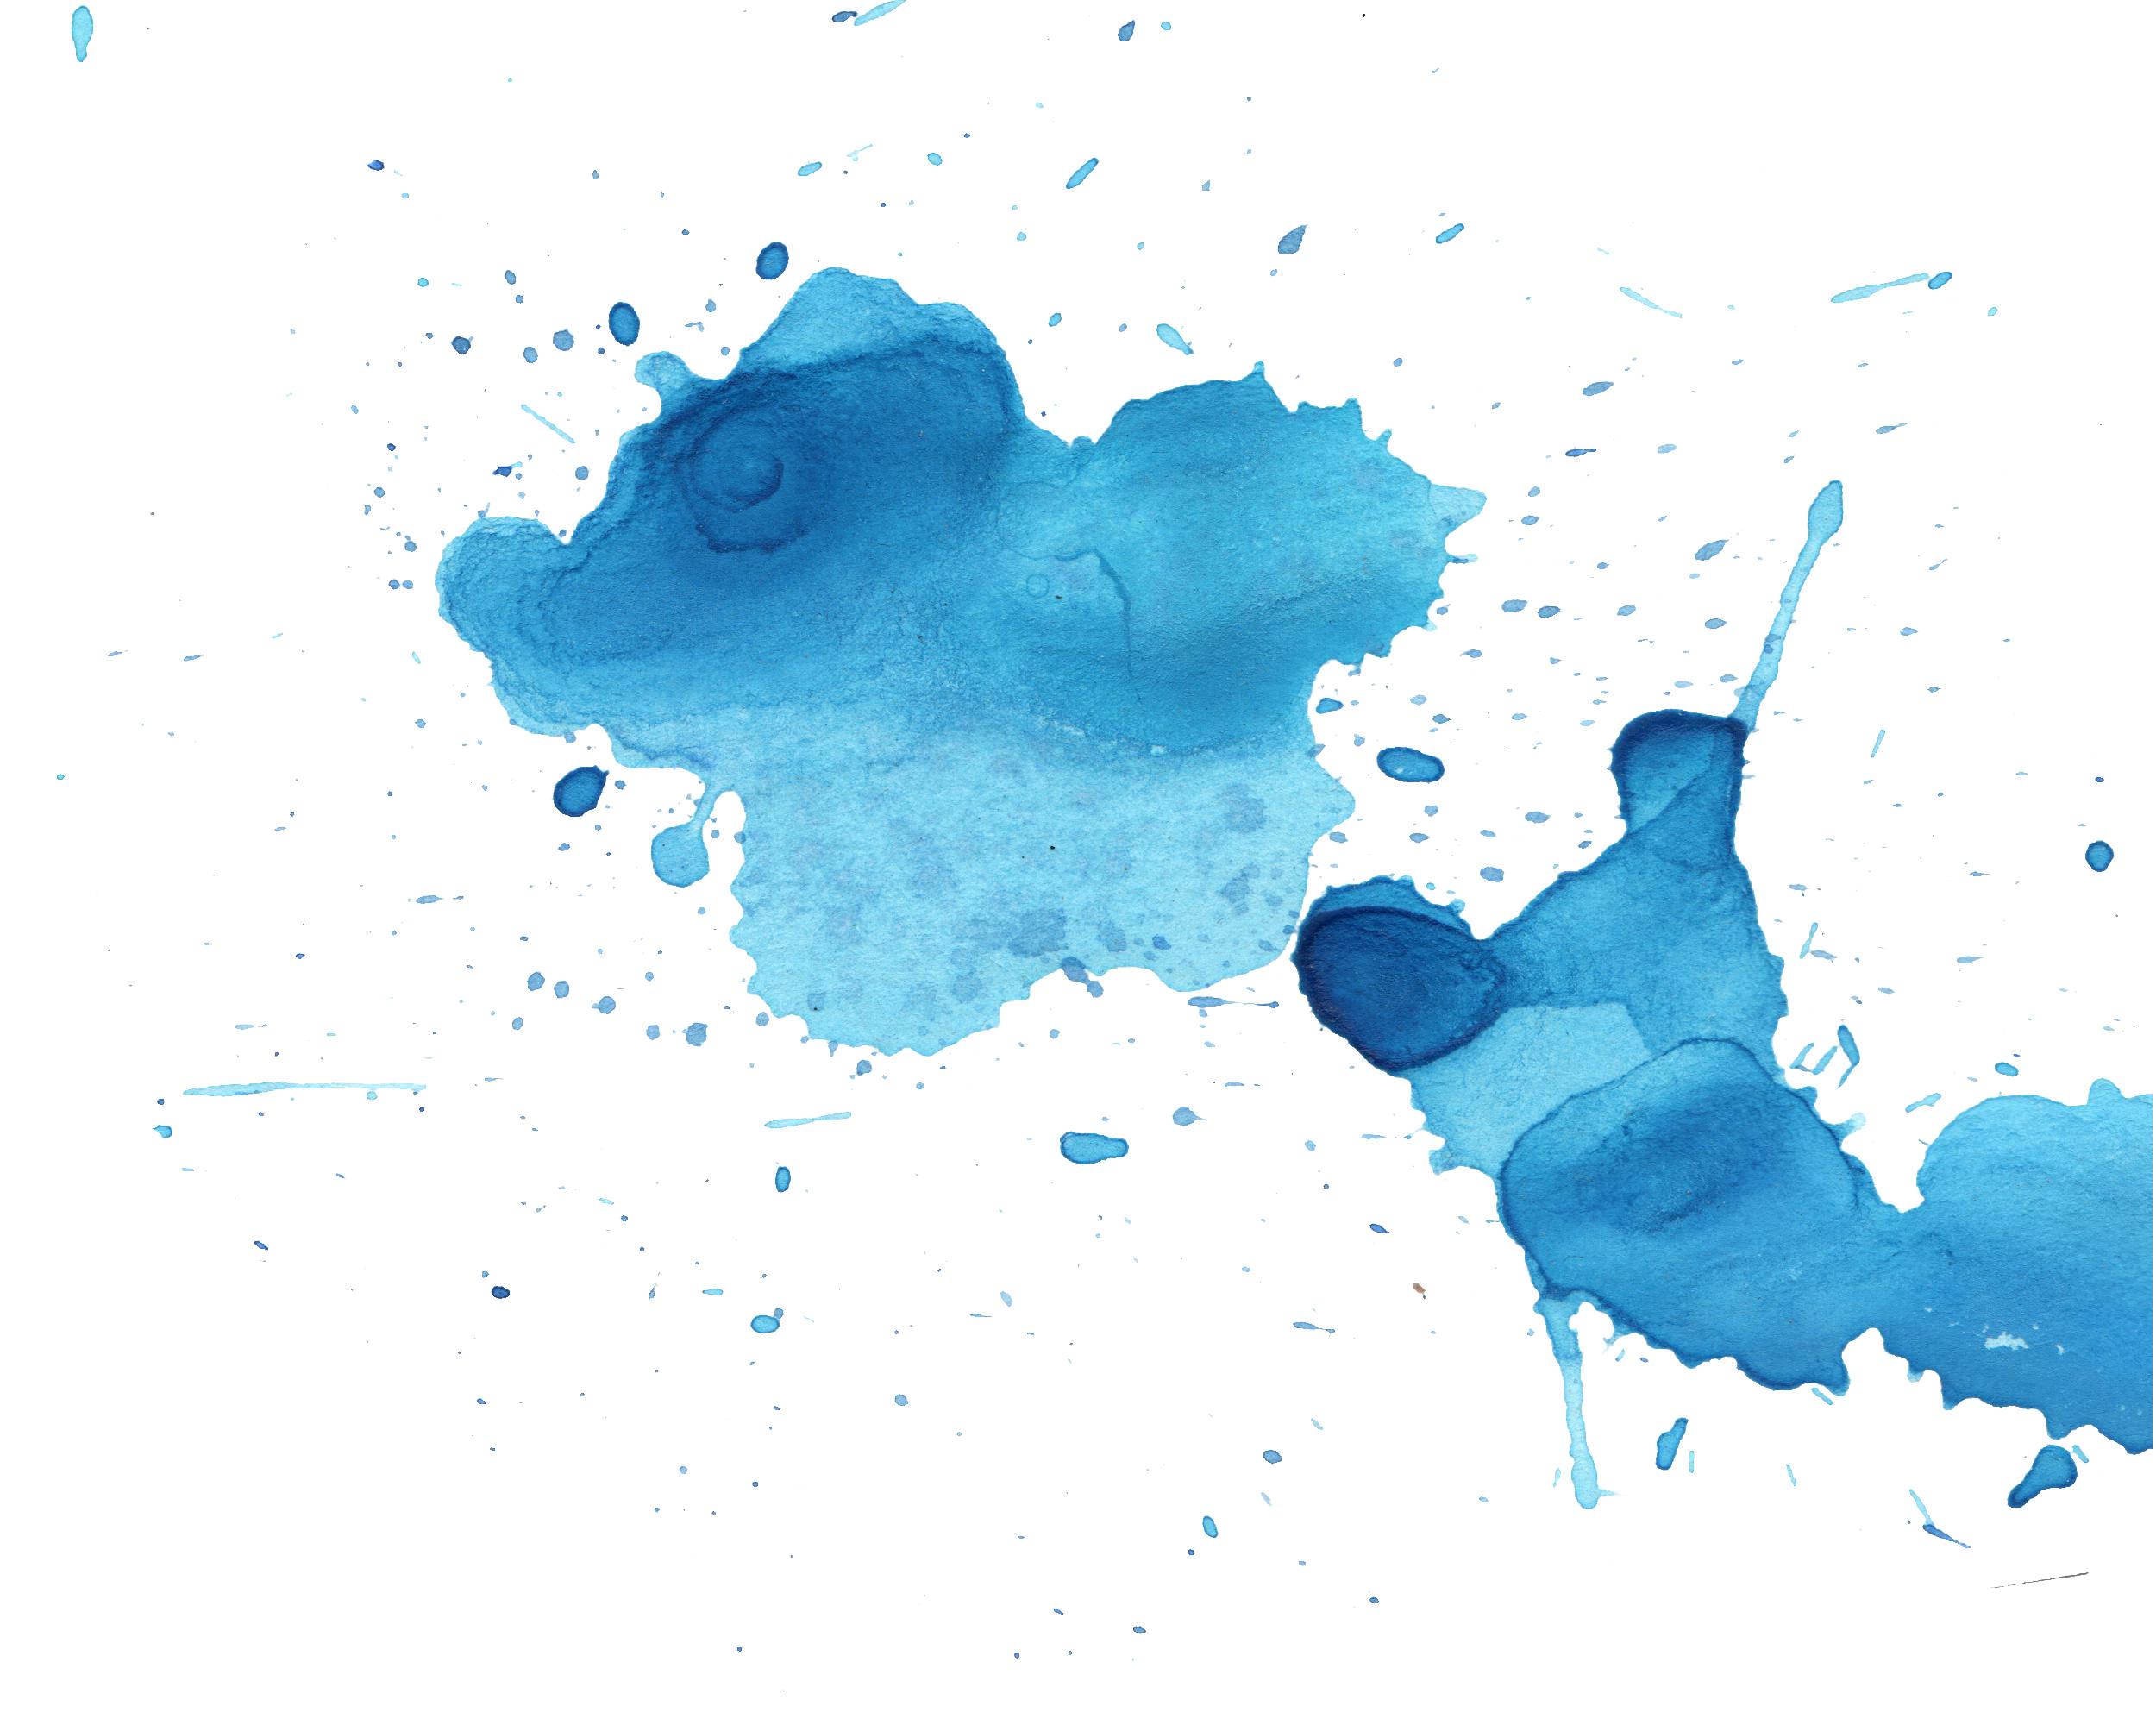 Free download blue watercolor splatter texture 13 jpg